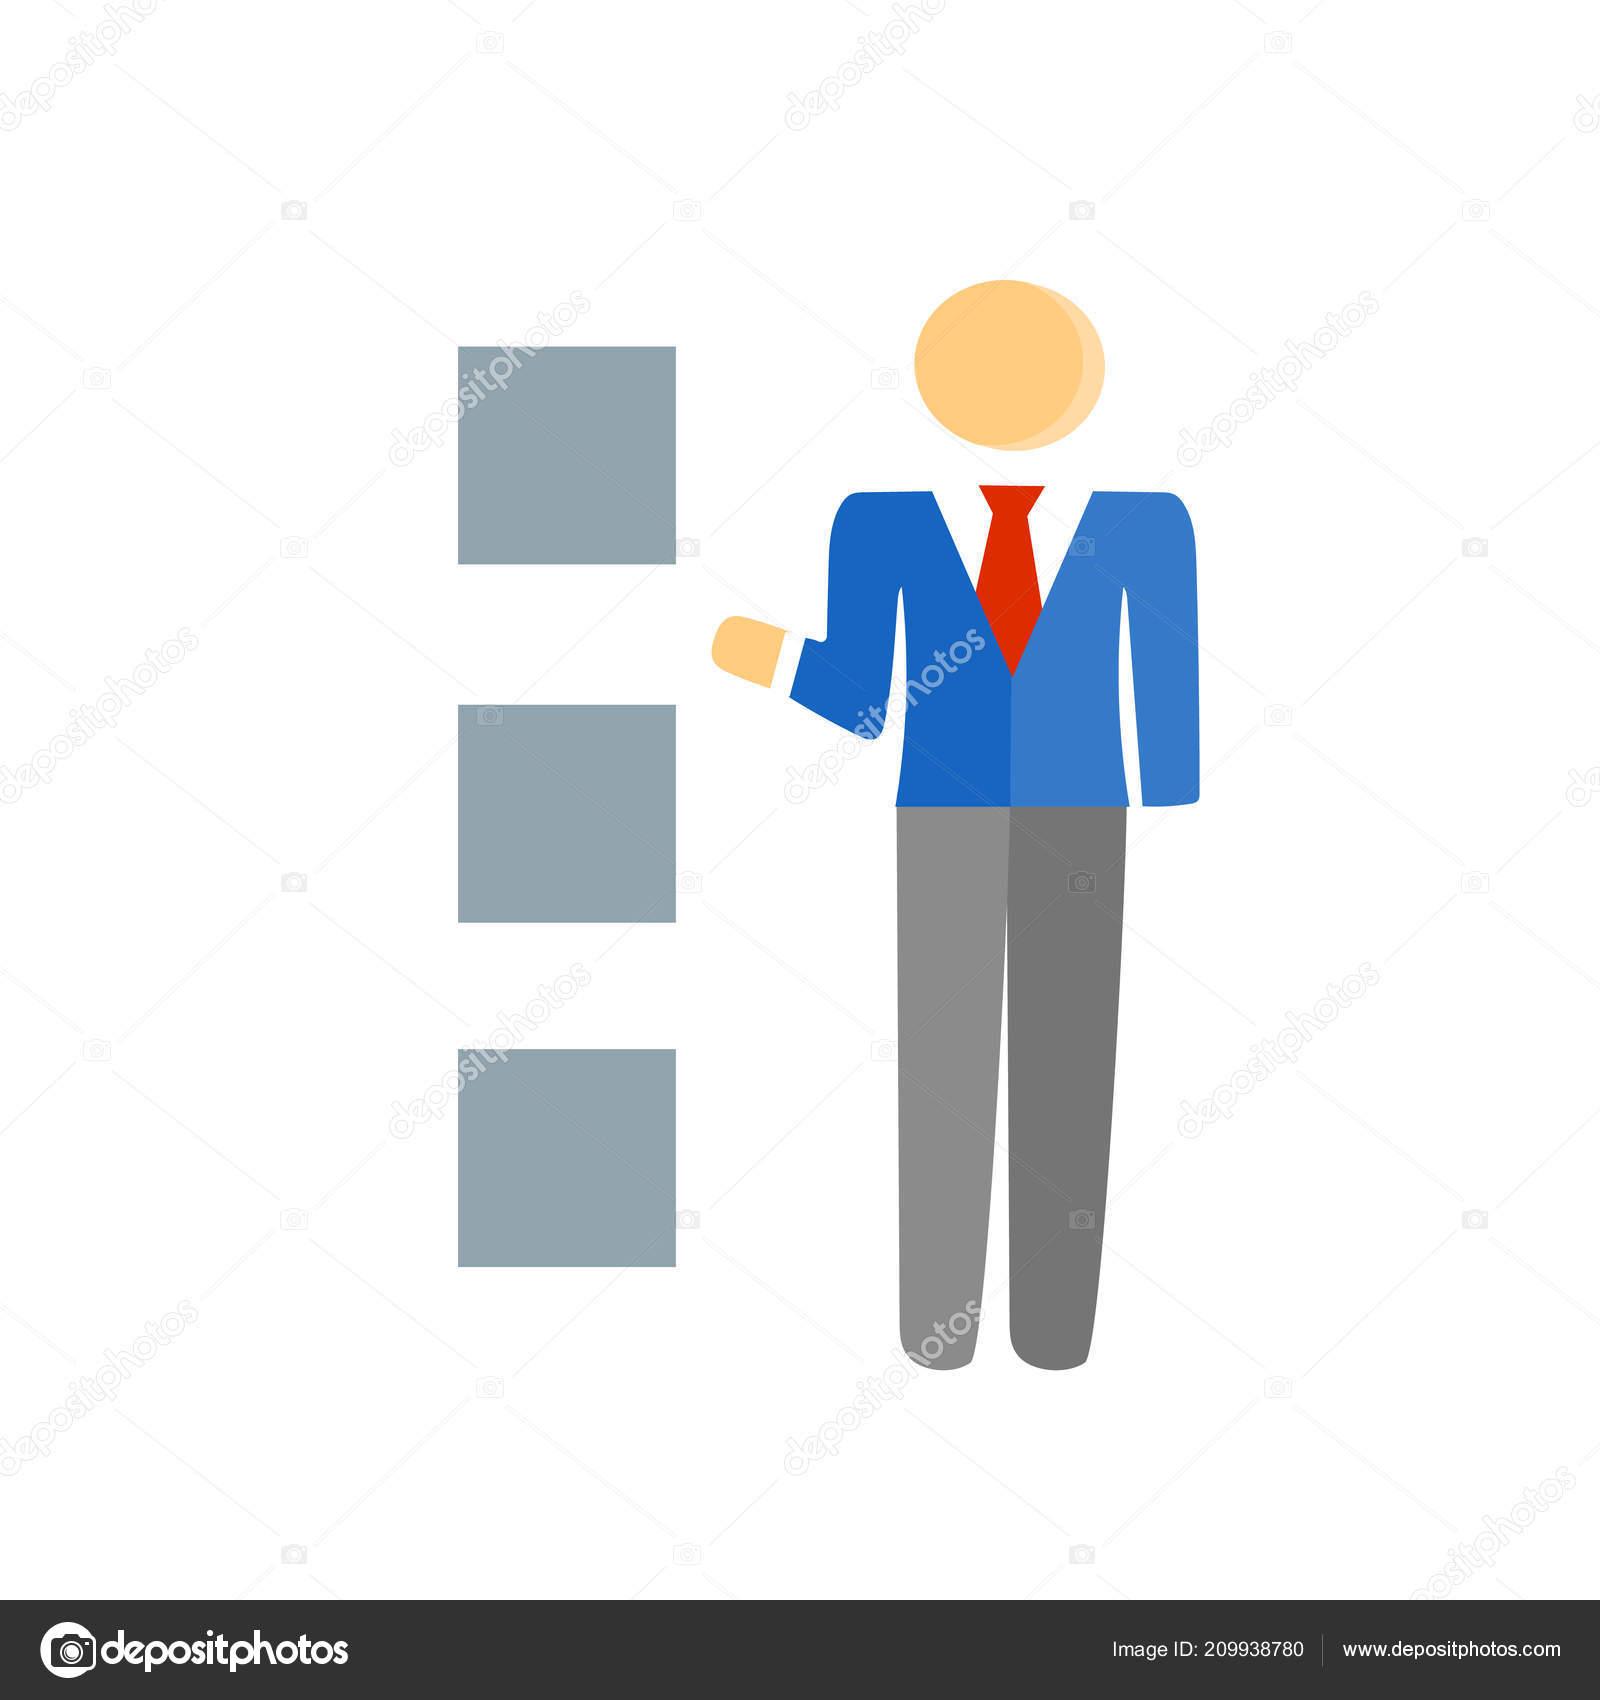 Dolap Simge Vektor Web Mobil Uygulamasi Tasarim Dolap Logo